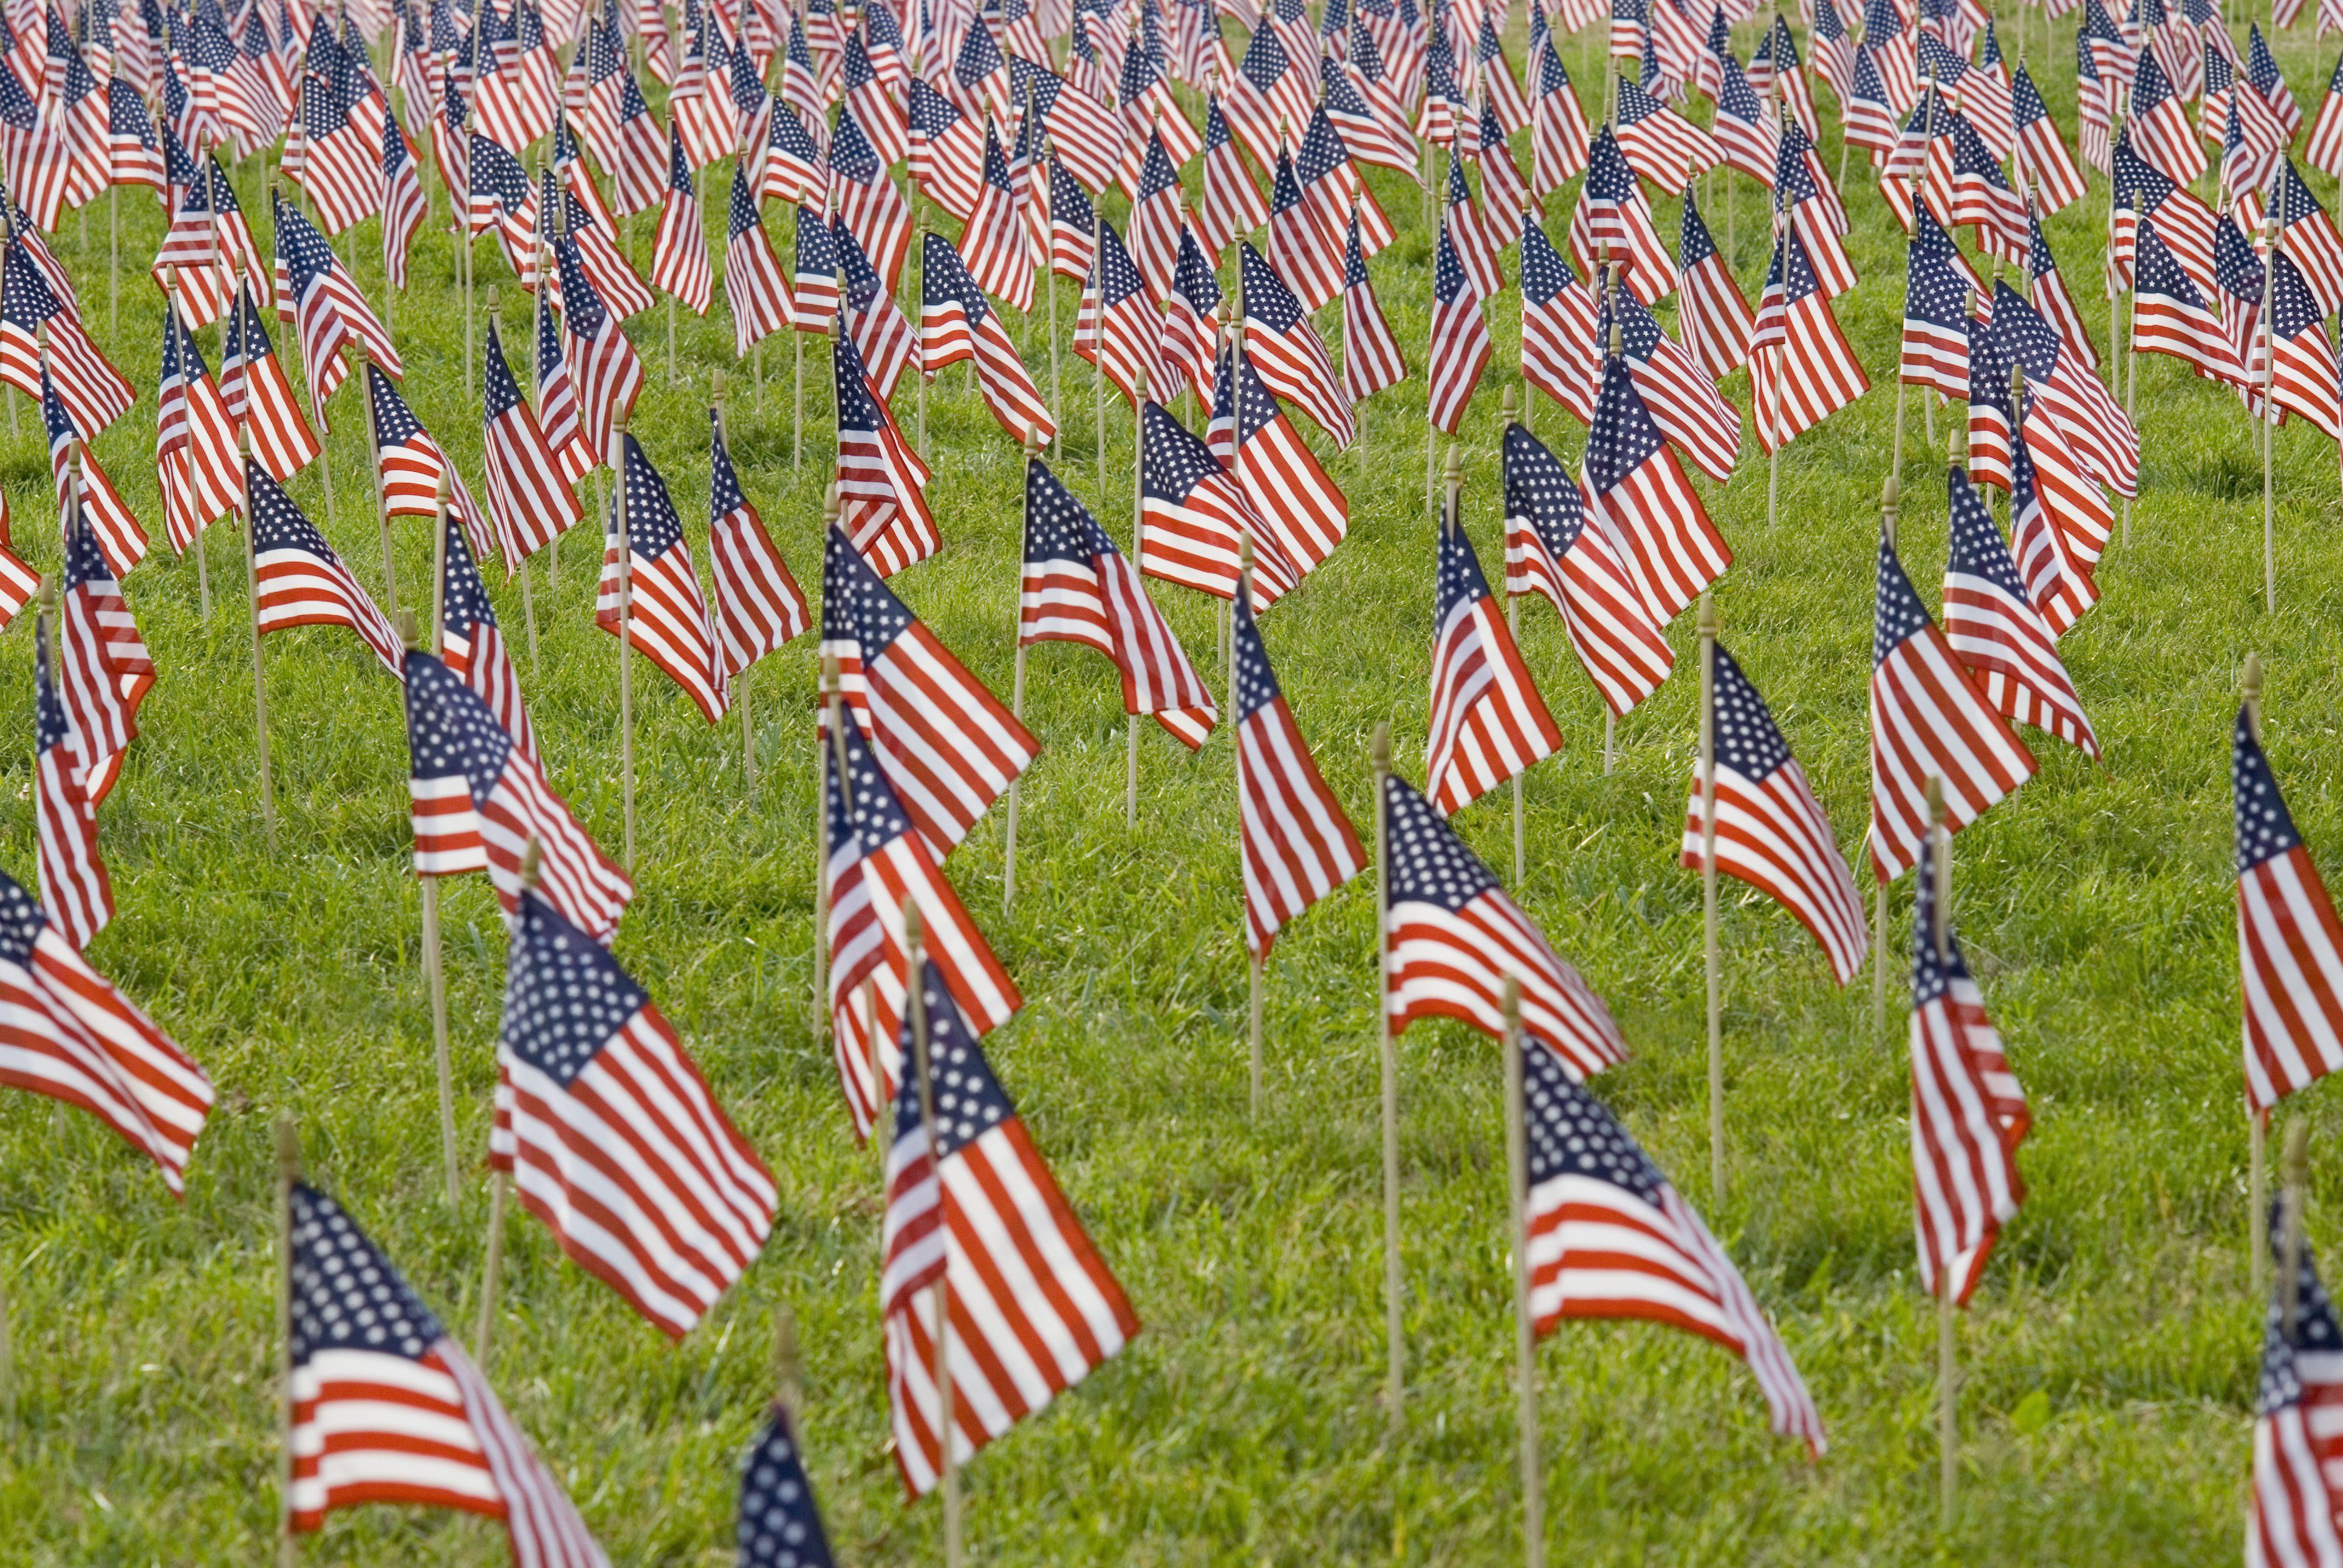 American flags displayed on The National Mall, Washington, DC